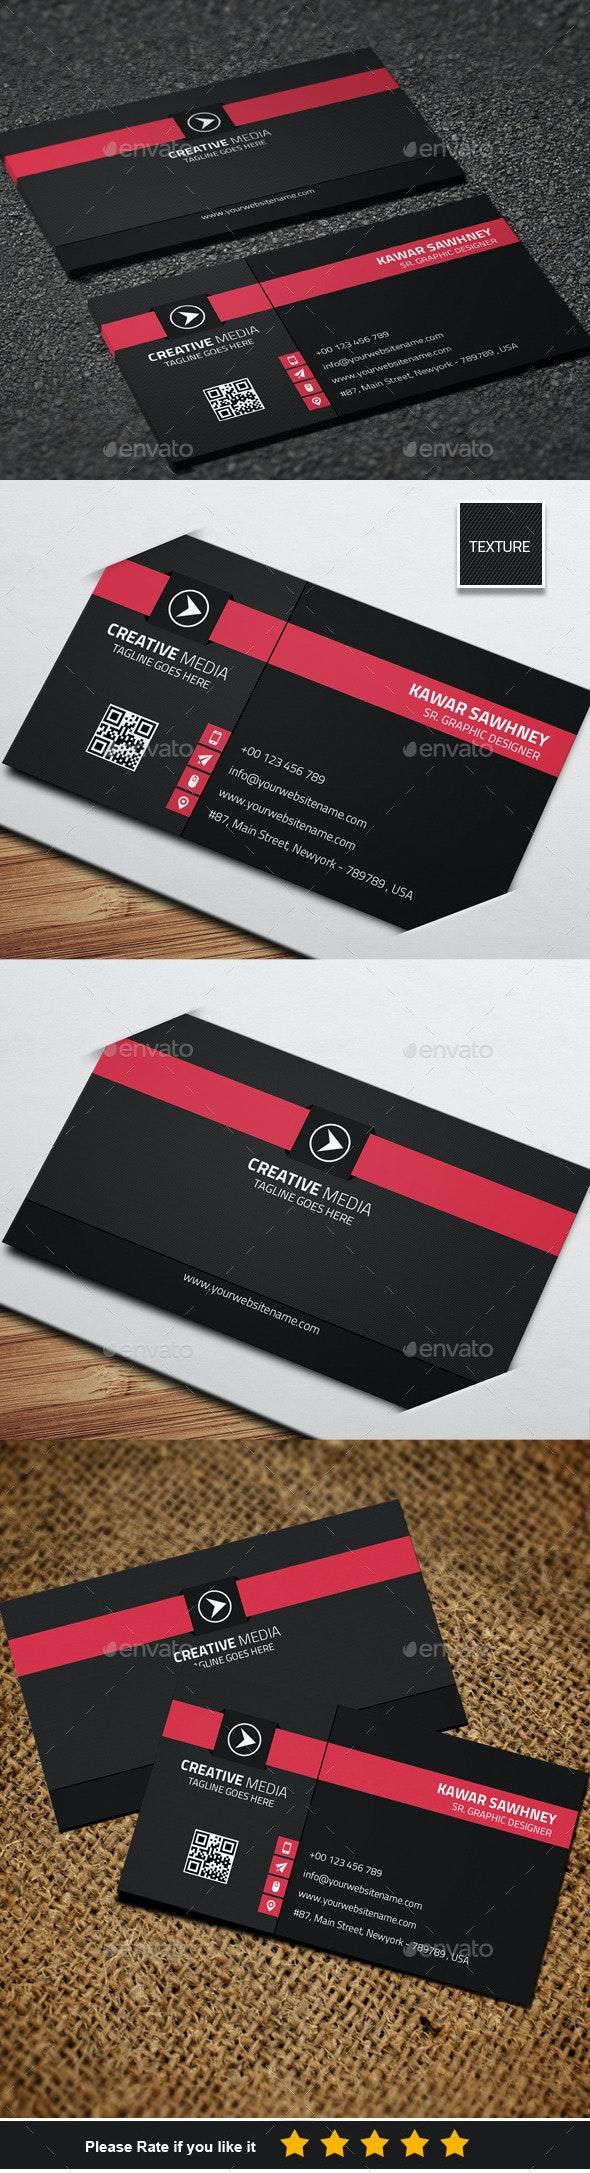 Corporate Business Card 11 - Corporate Business Cards